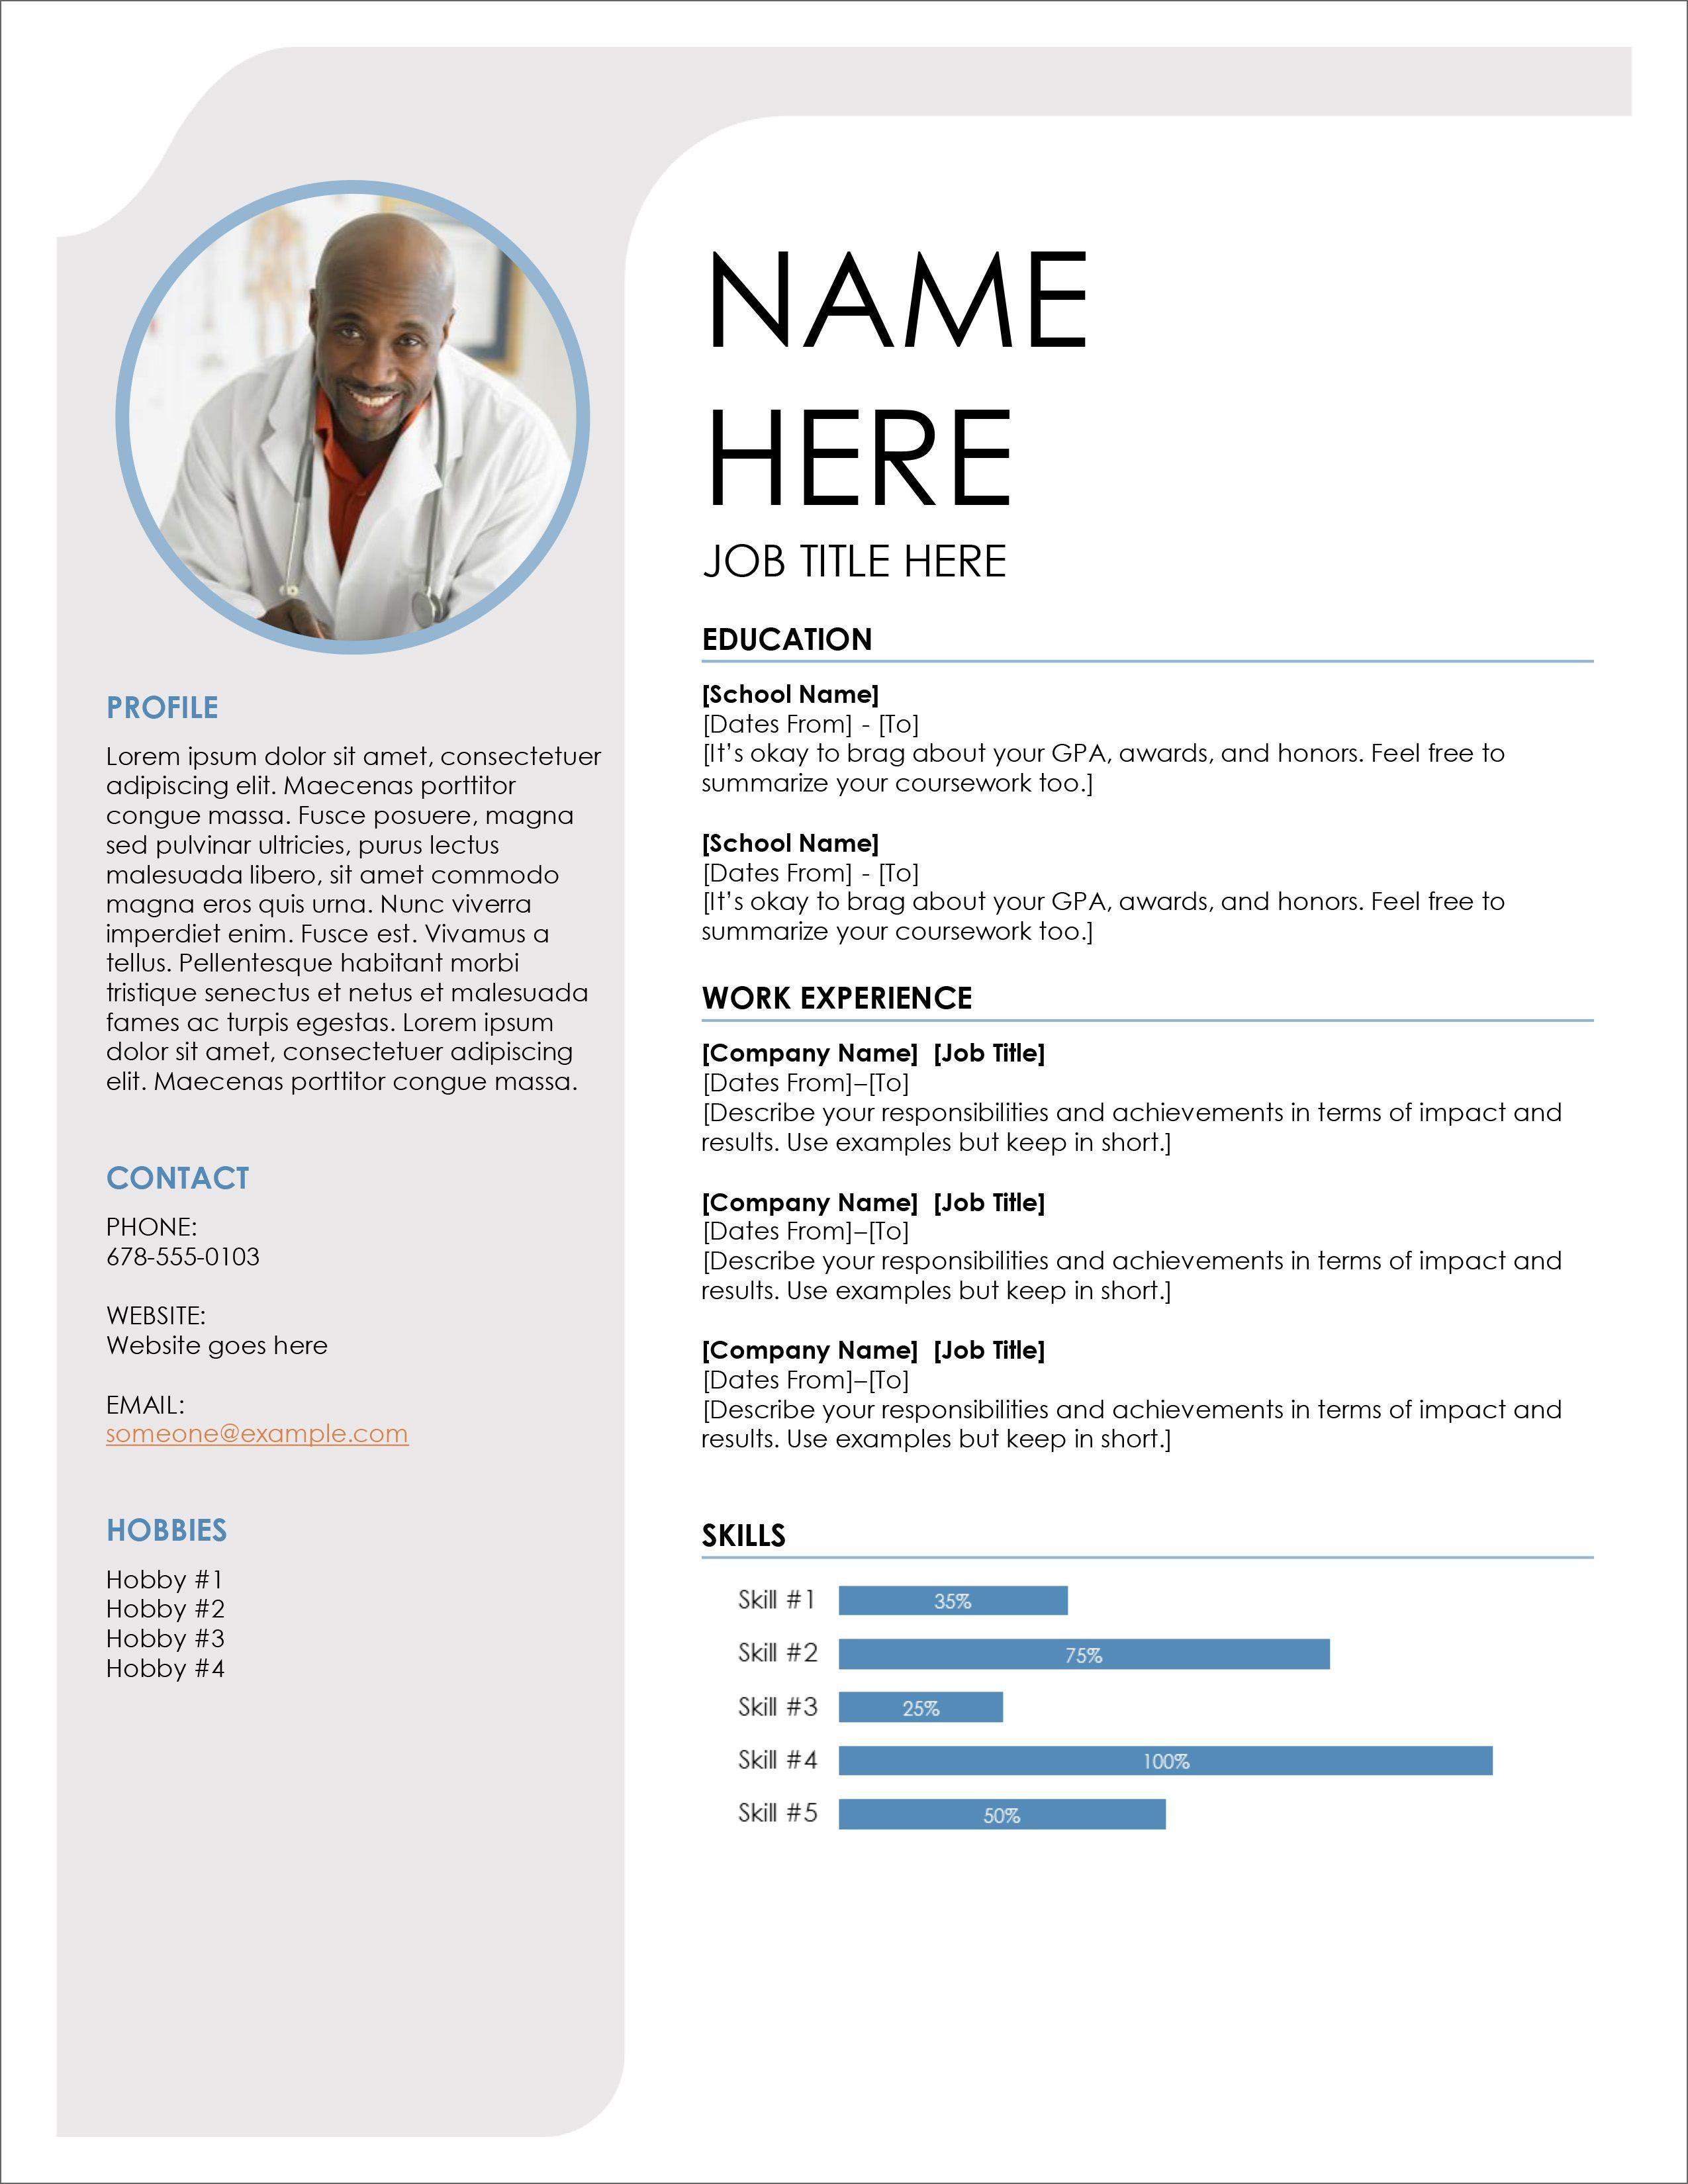 Free Professional Resume Template Graphic design resume